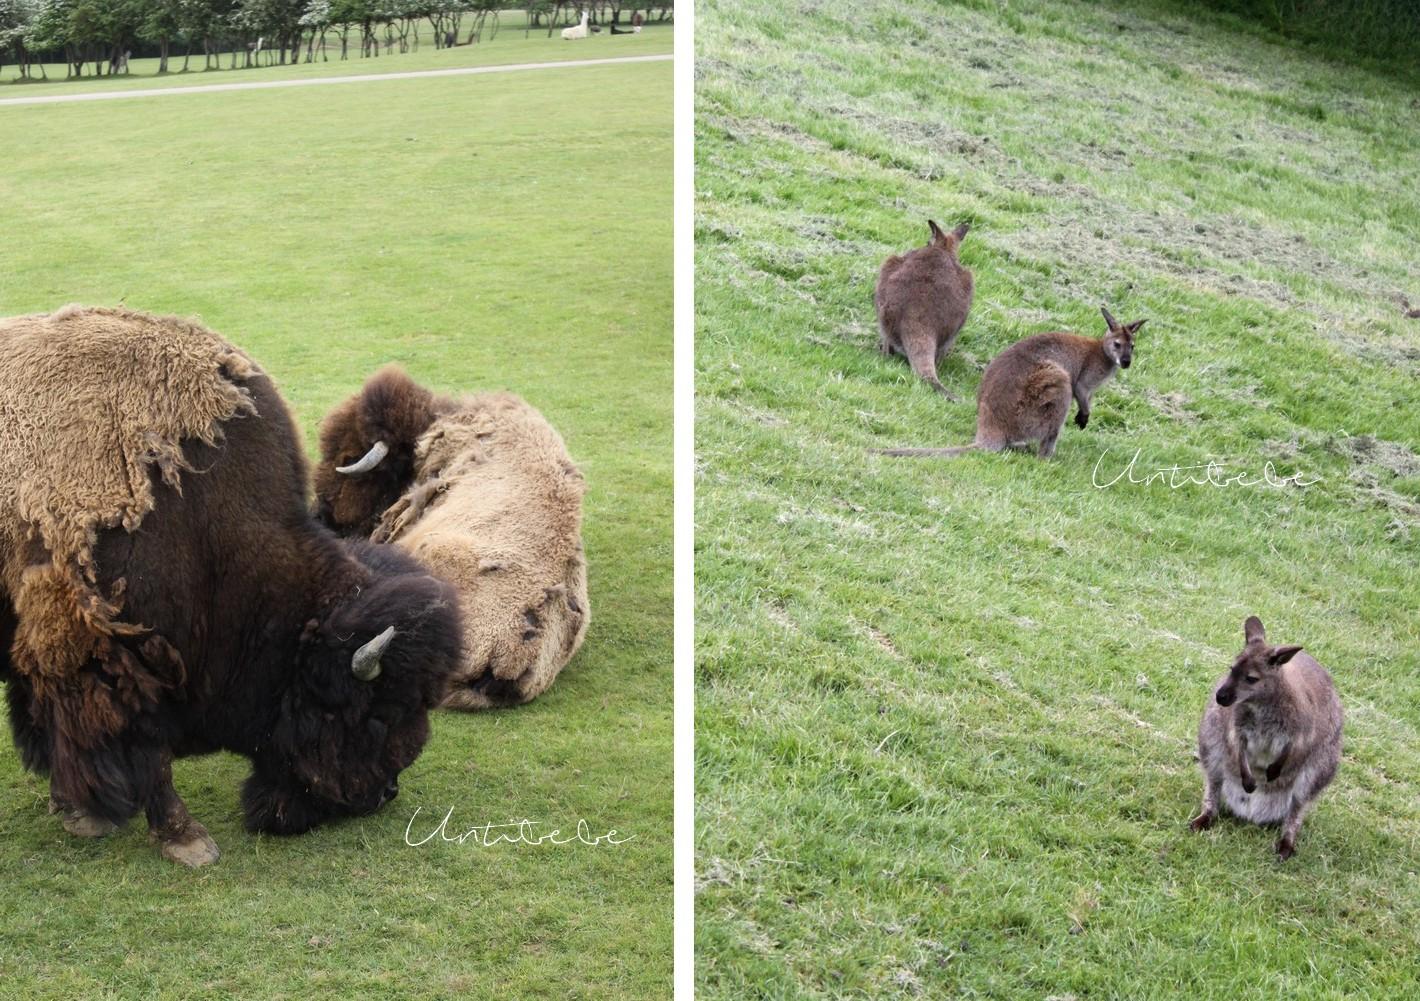 kangourou bison parc animalier planete sauvage